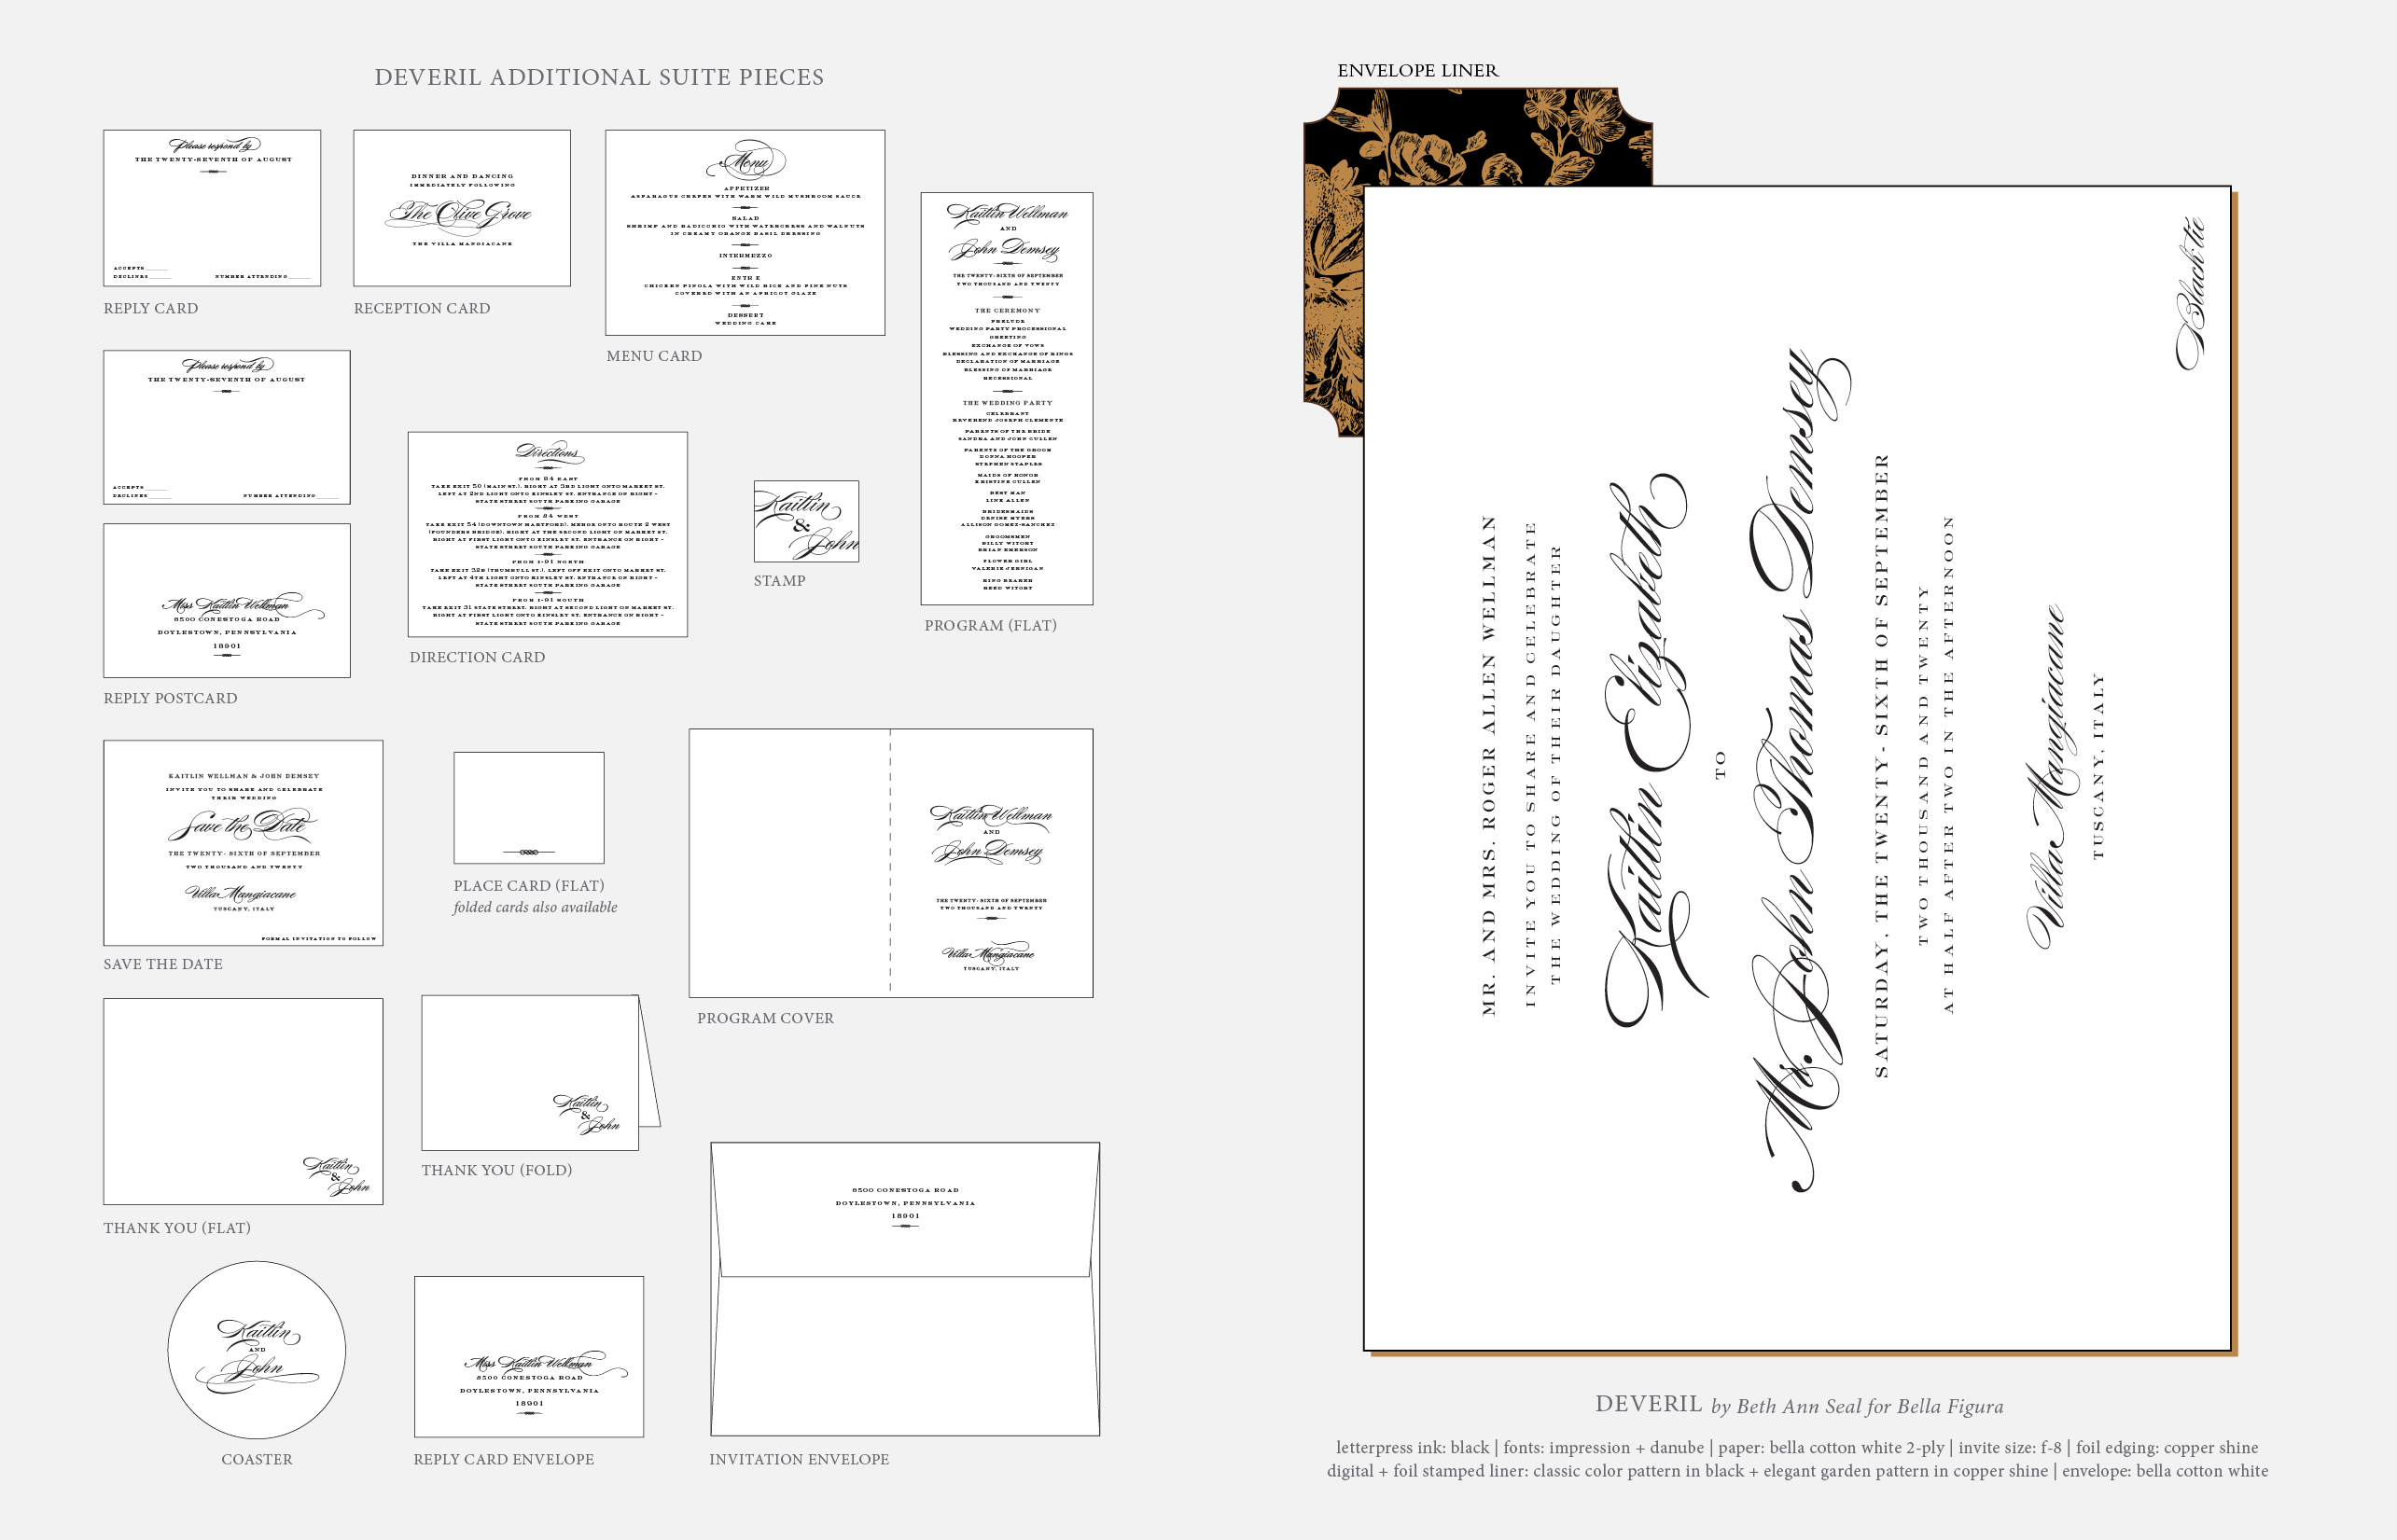 deveril classic letterpress wedding invitations from bella figura